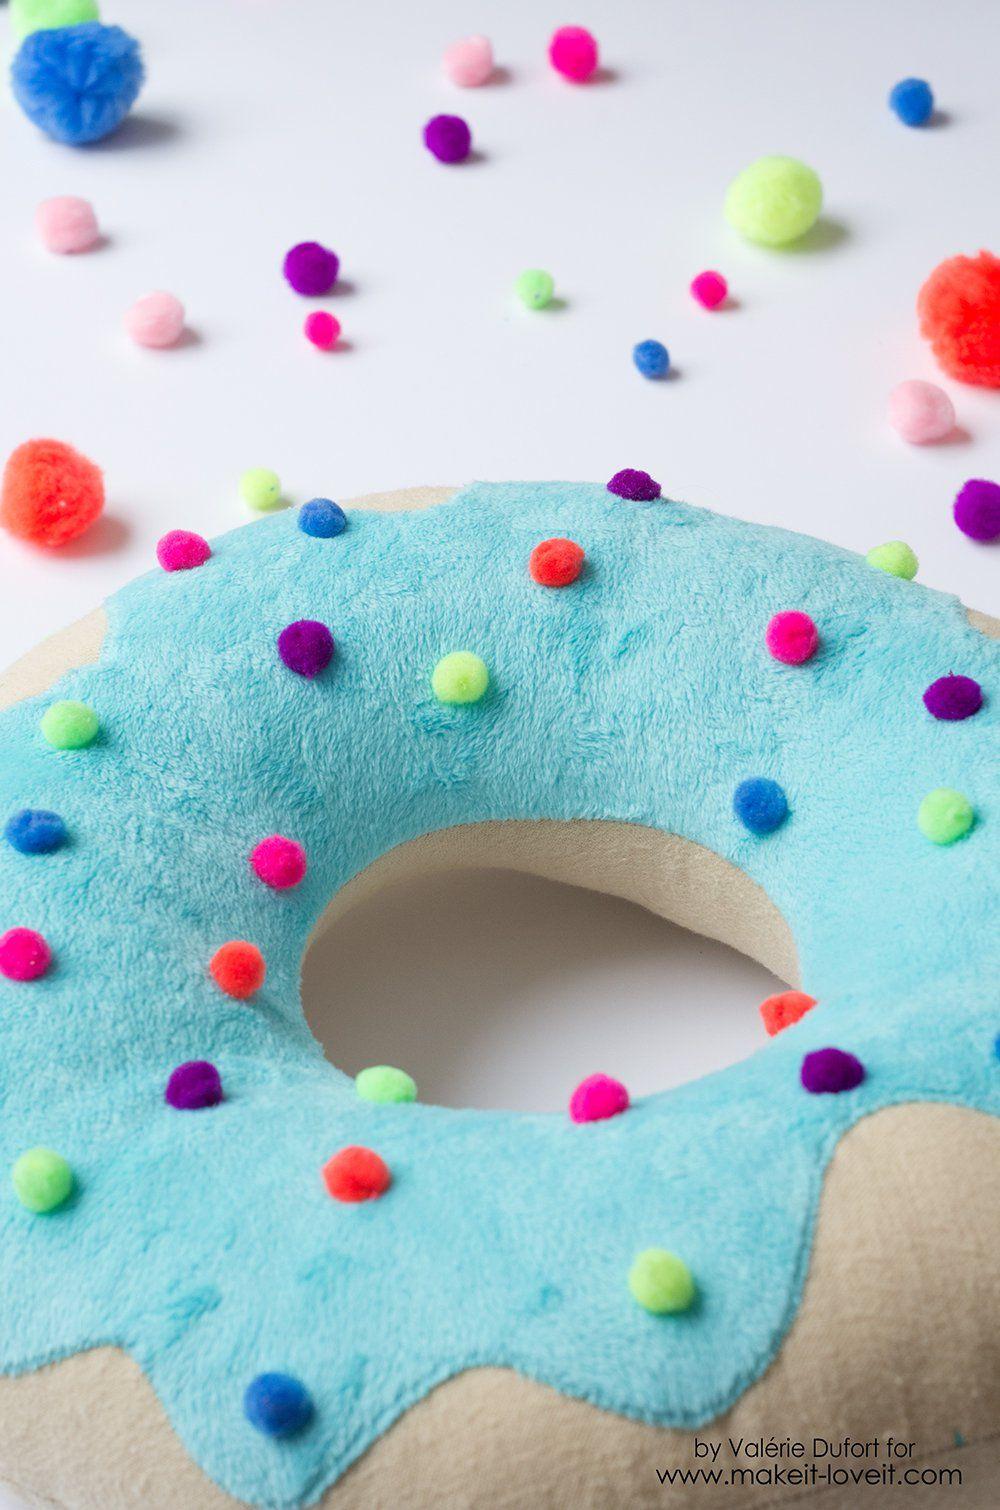 Delicious Donut Pillow Tutorial Donut Pillow Donut Decorations Diy Pillows